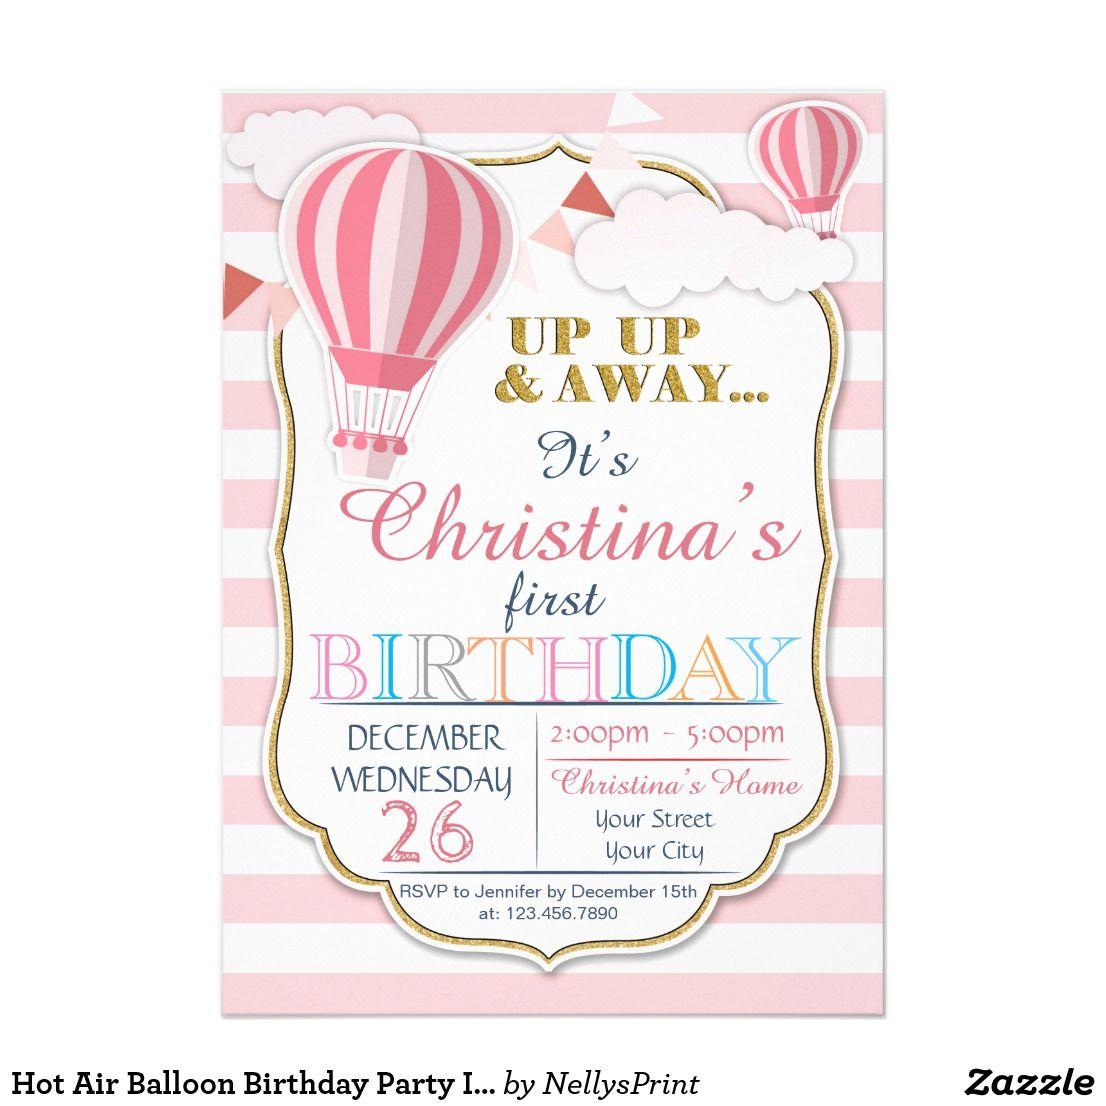 Hot Air Balloon Birthday Party Invitation | Lindens 1st Birthday ...